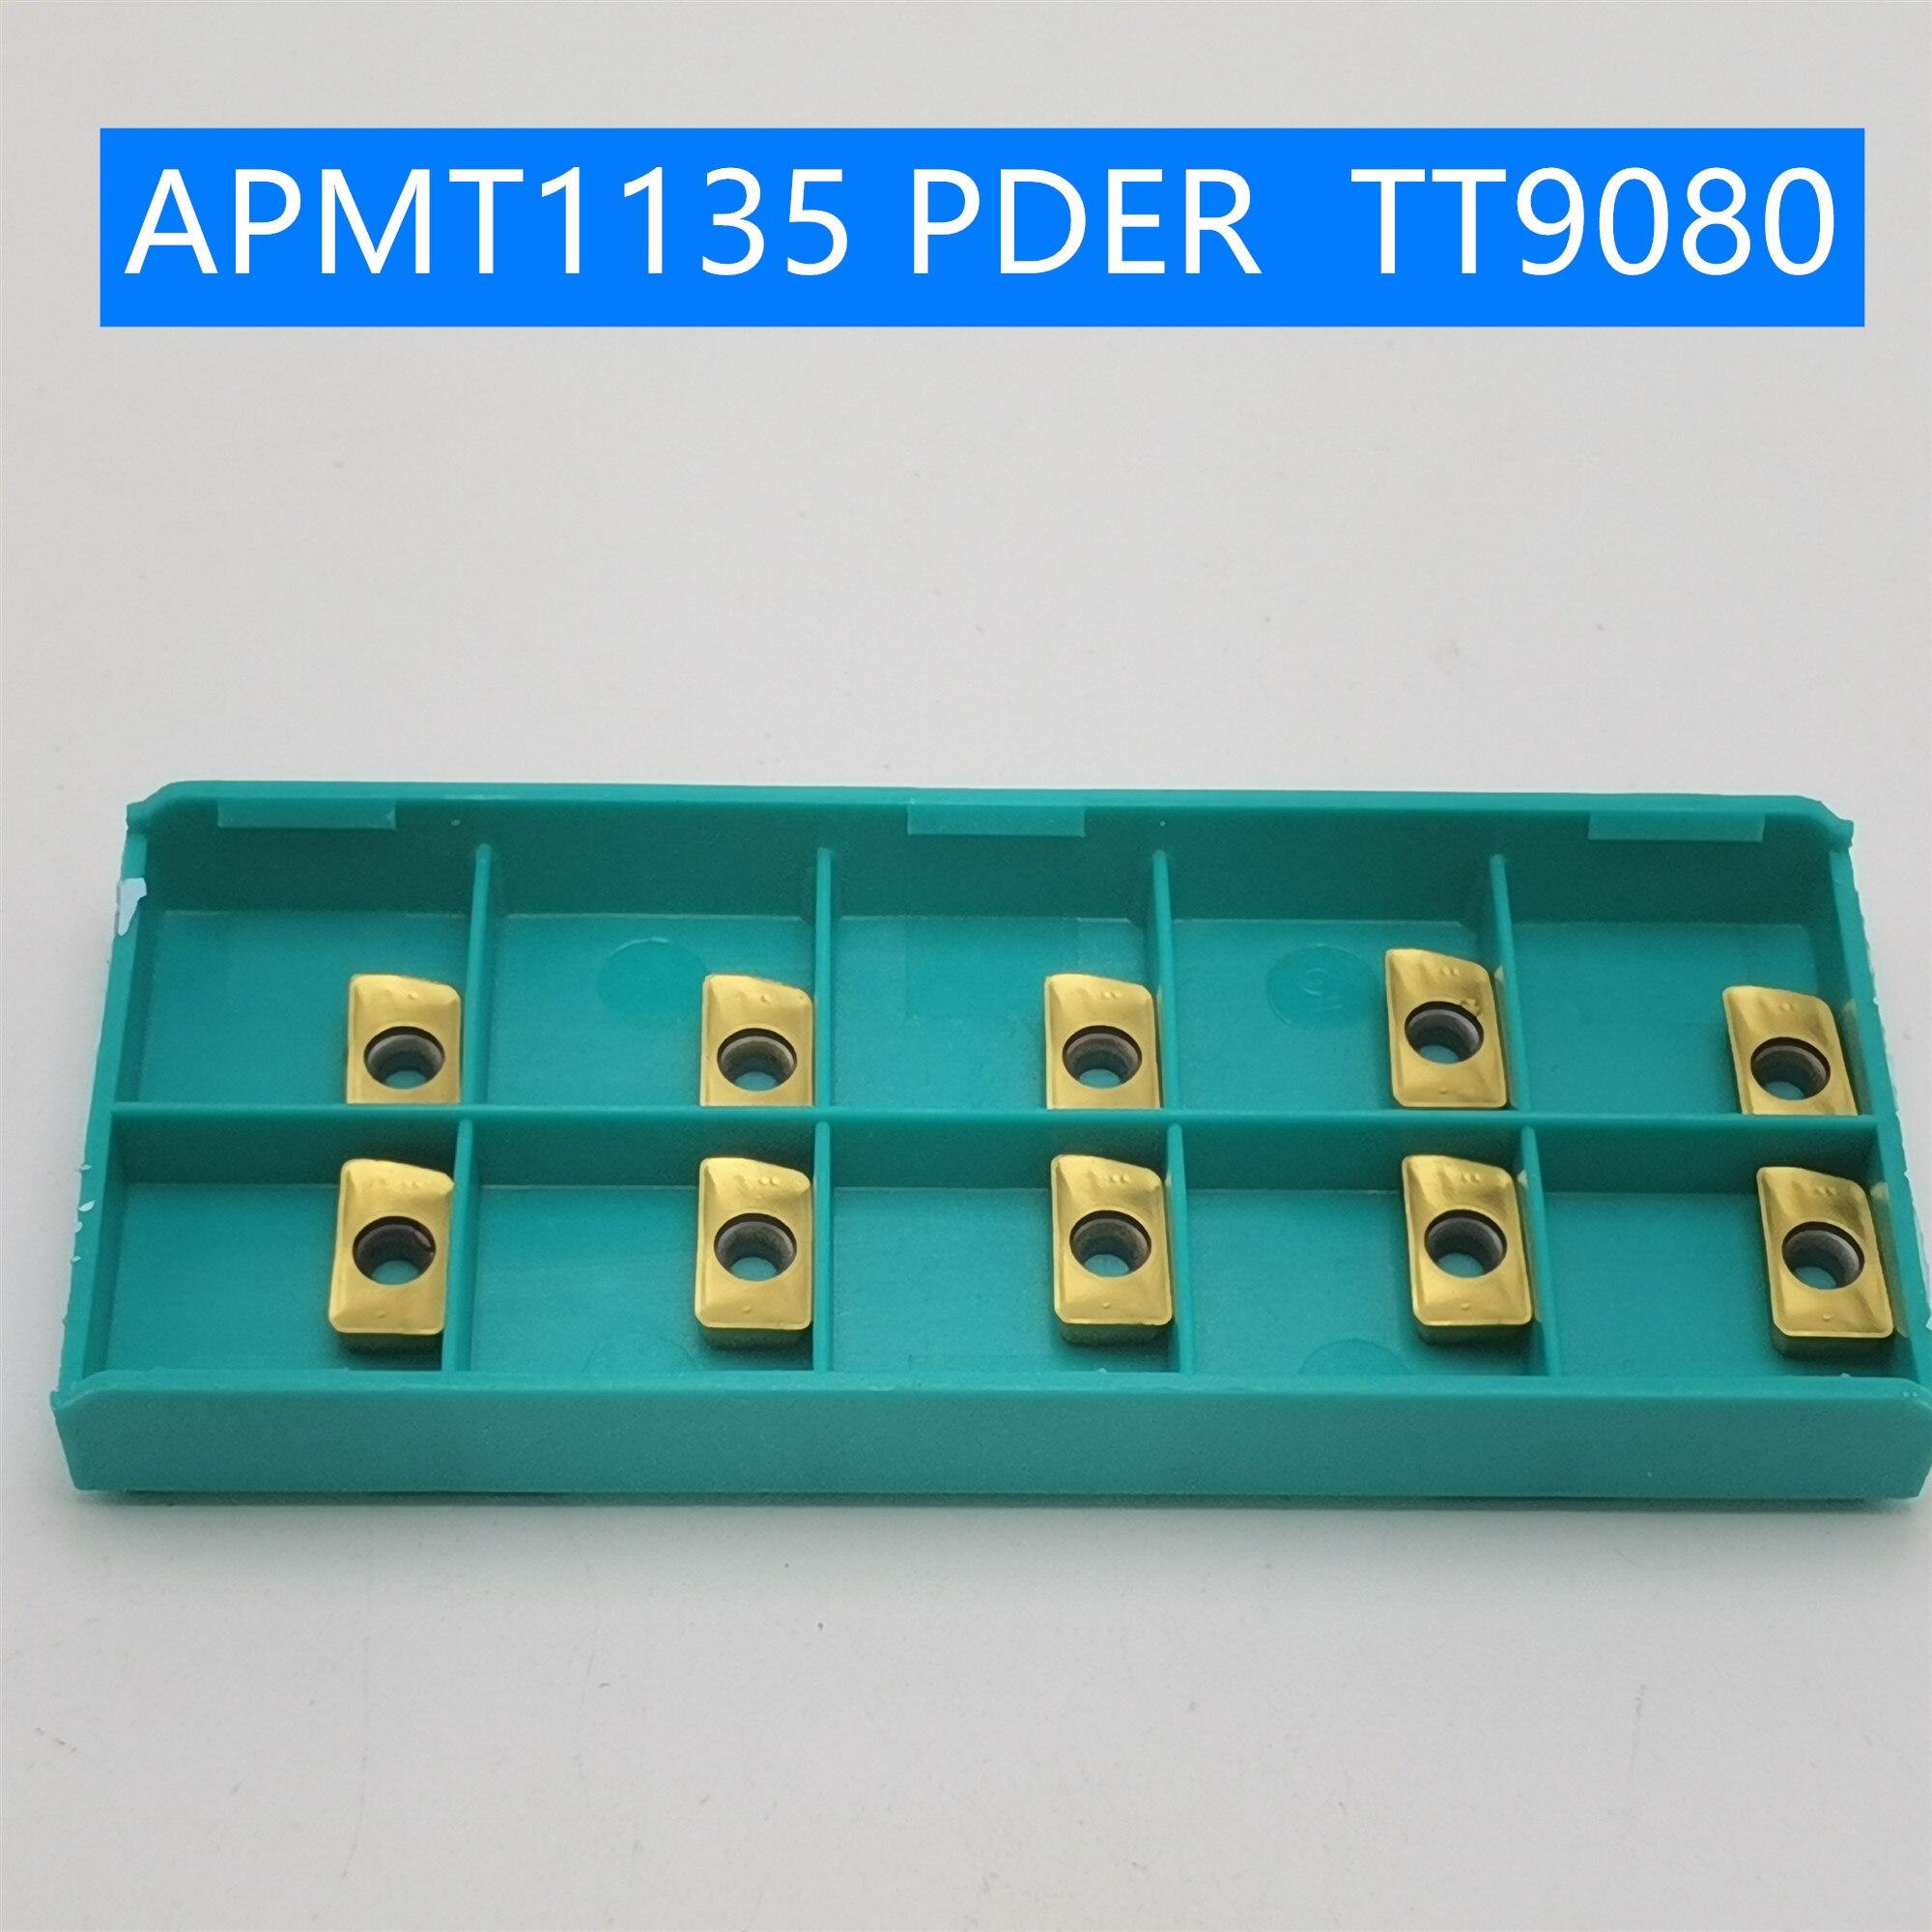 20pcs Tungsten Carbide APMT1135 PDER TT9080 Turning Tool Carbide Insert  APMT 1135 Face Milling Cutter APMT1135PDER Lathe Tool